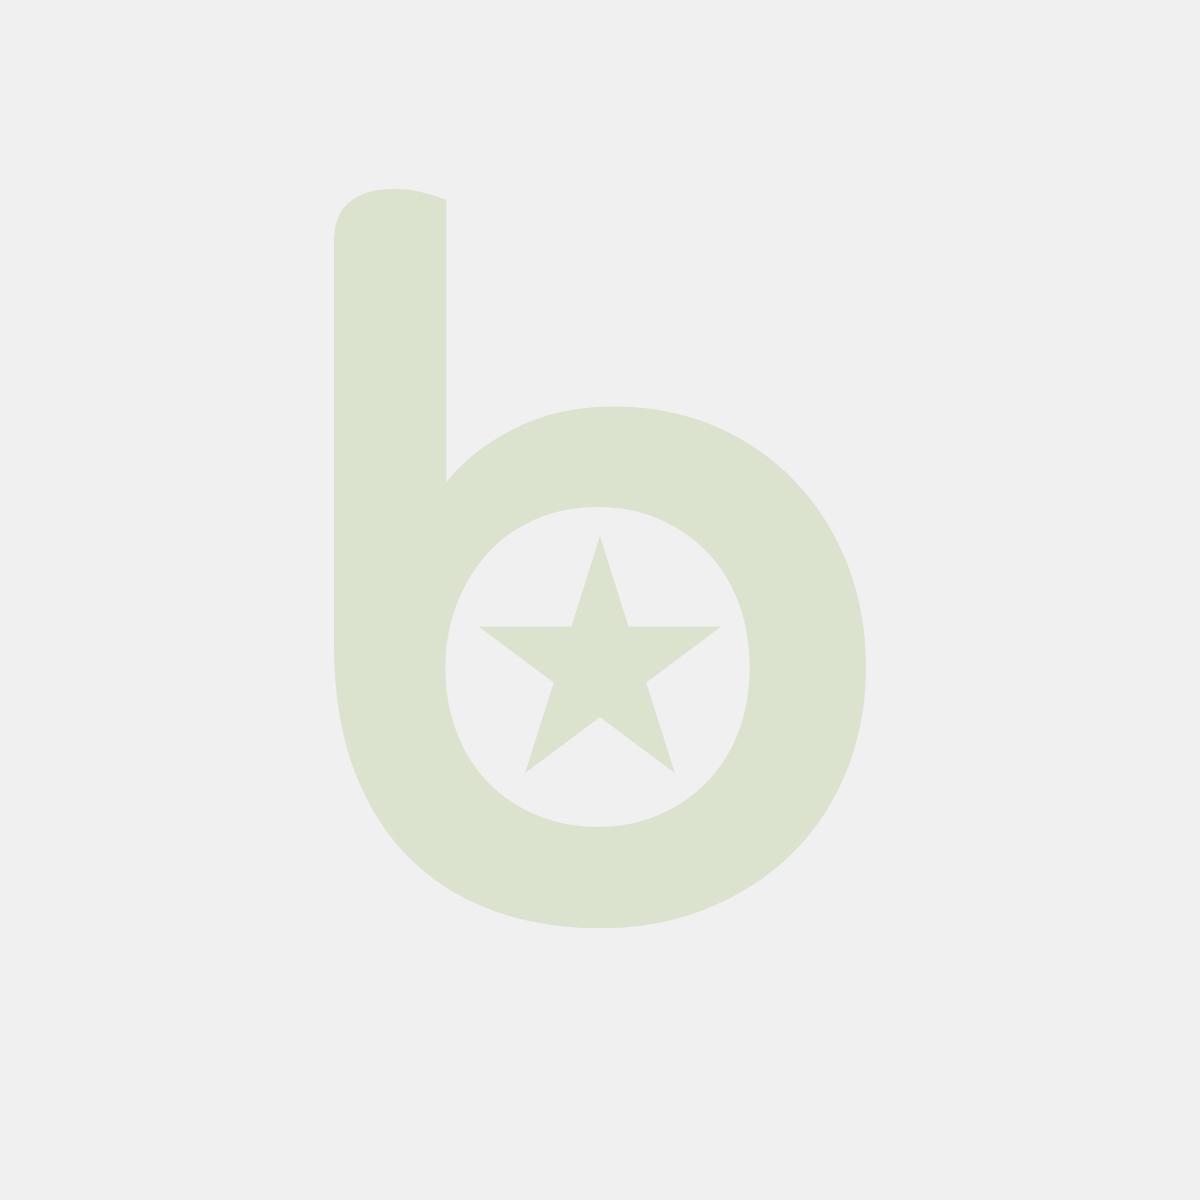 Garnek Średni Profi Line Z Pokrywką 23,5 L; Śr. 360 X 230 H